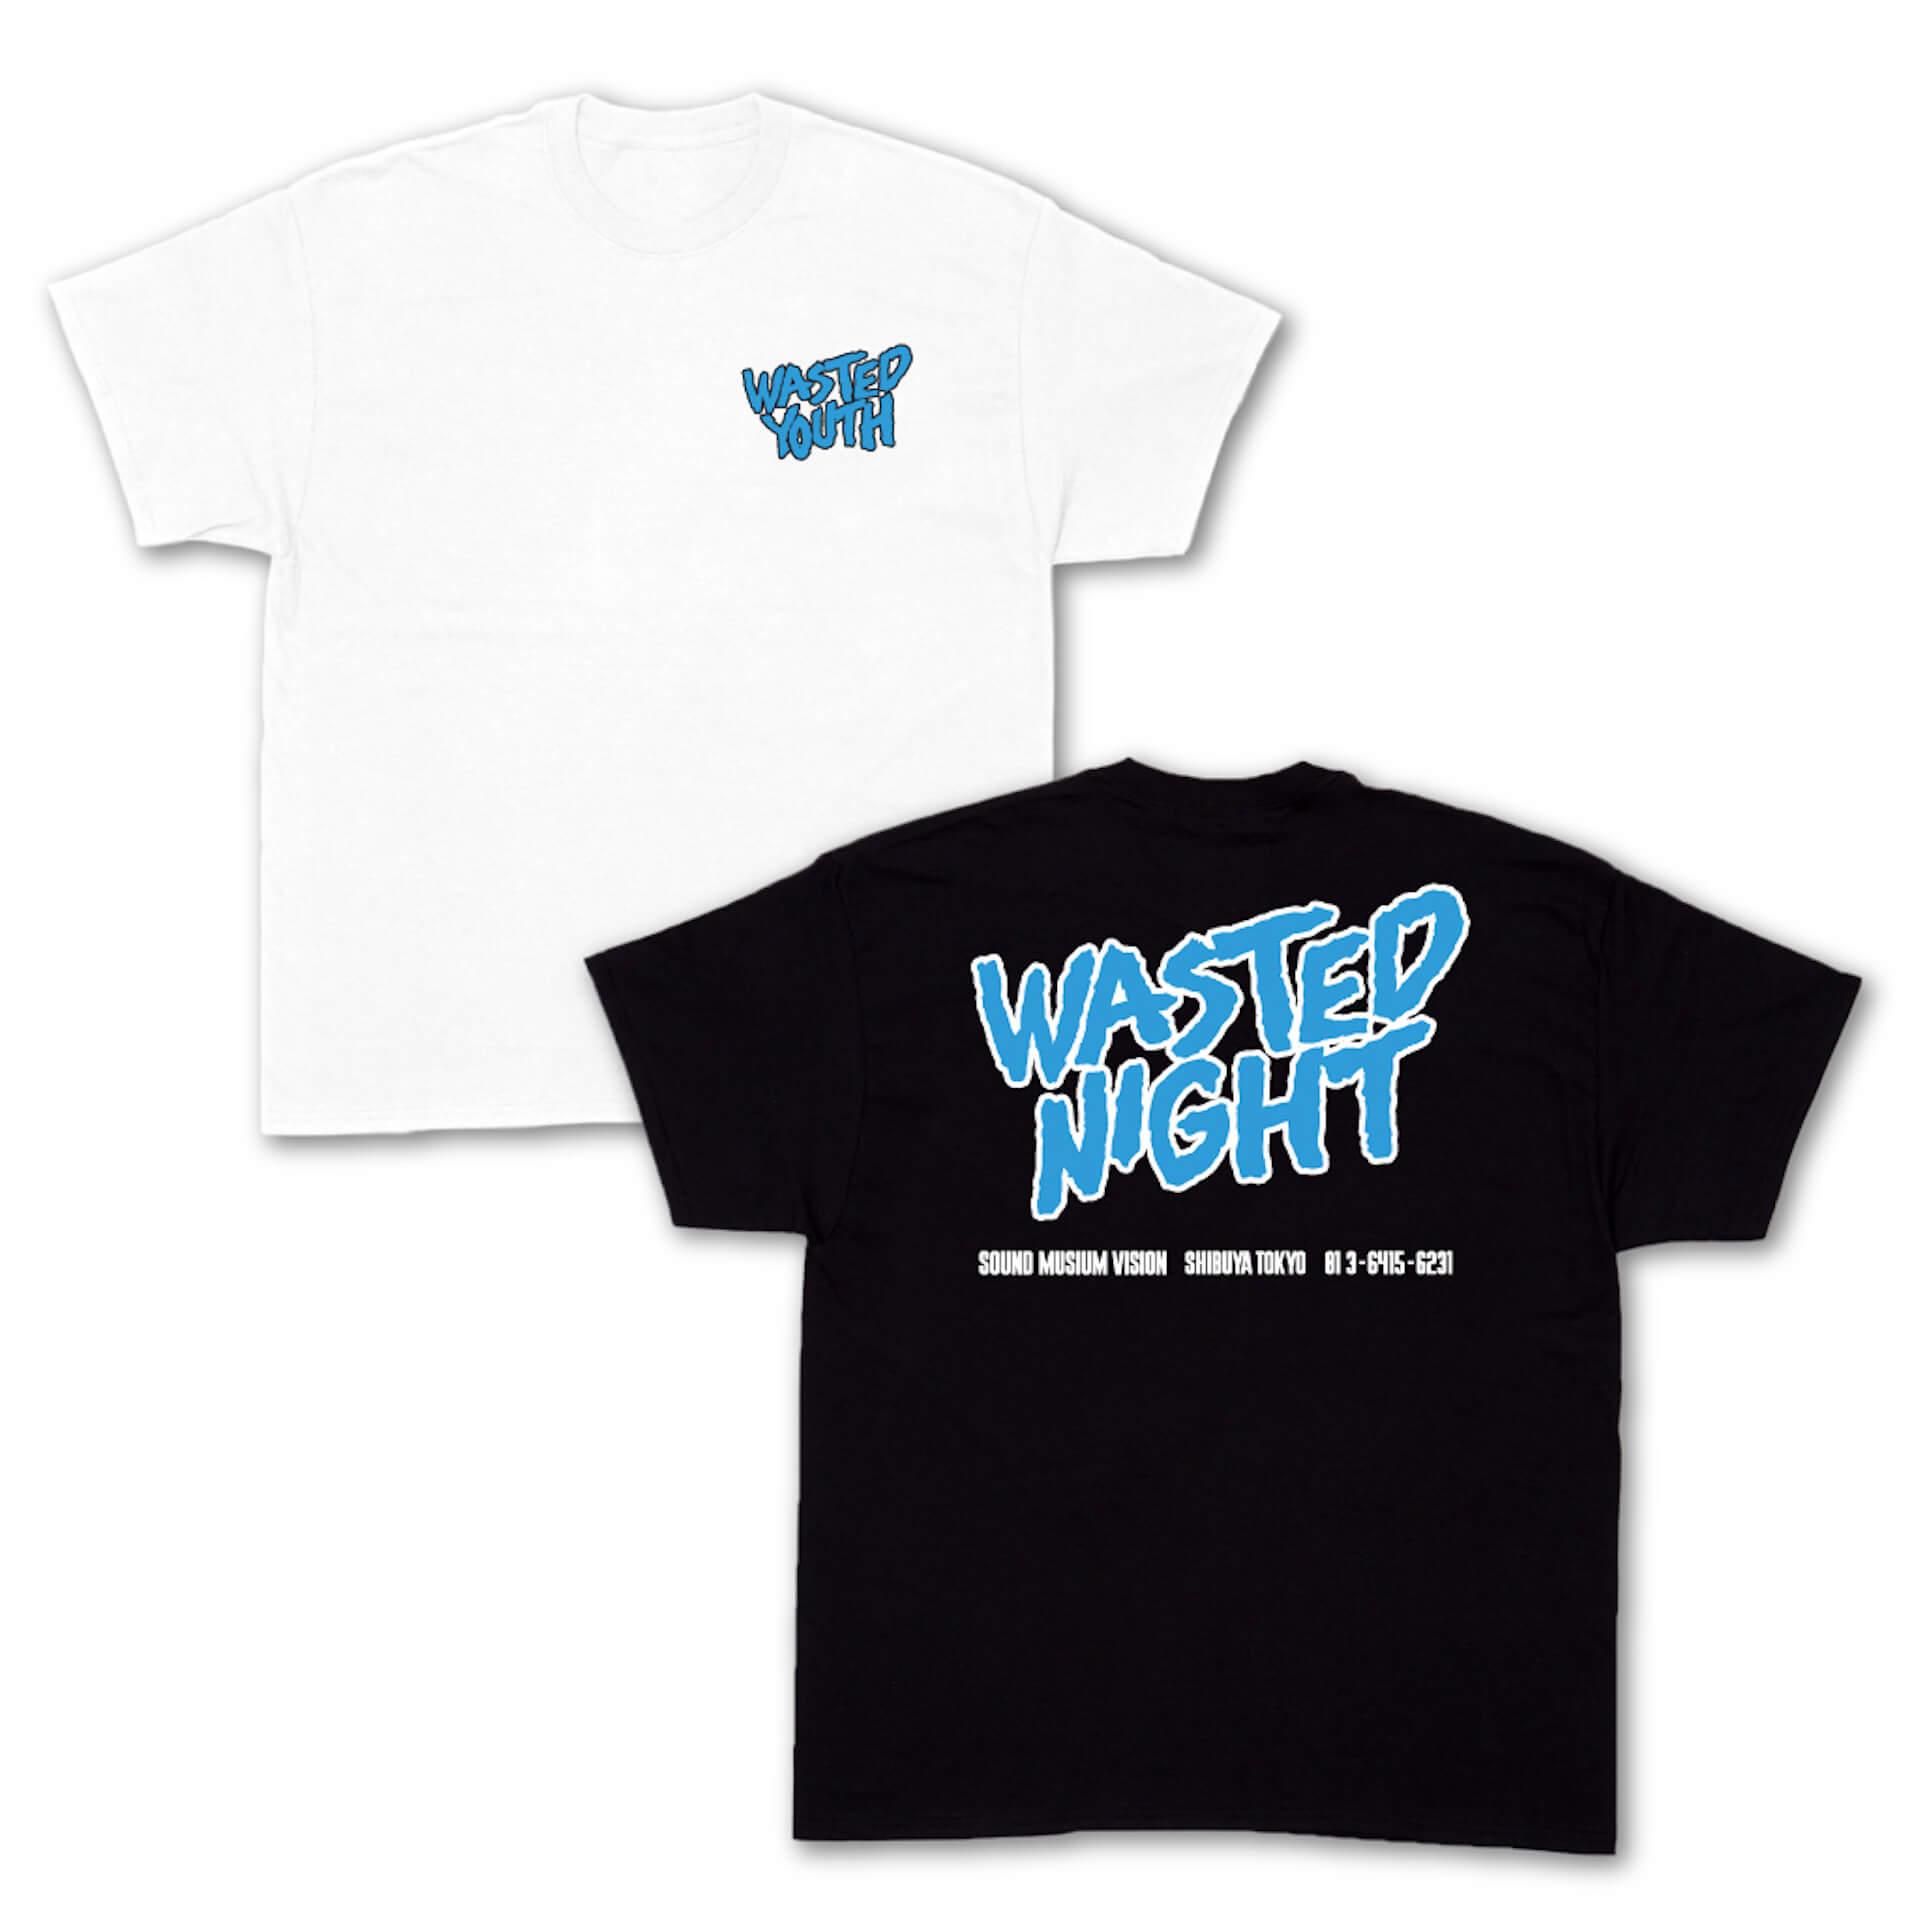 Contact Tokyo&SOUND MUSEUM VISIONのオリジナルデザインTシャツが発売決定!野村訓市、UNDERCOVER、VERDY、YAGIが参加 life210713_contact_vision_2